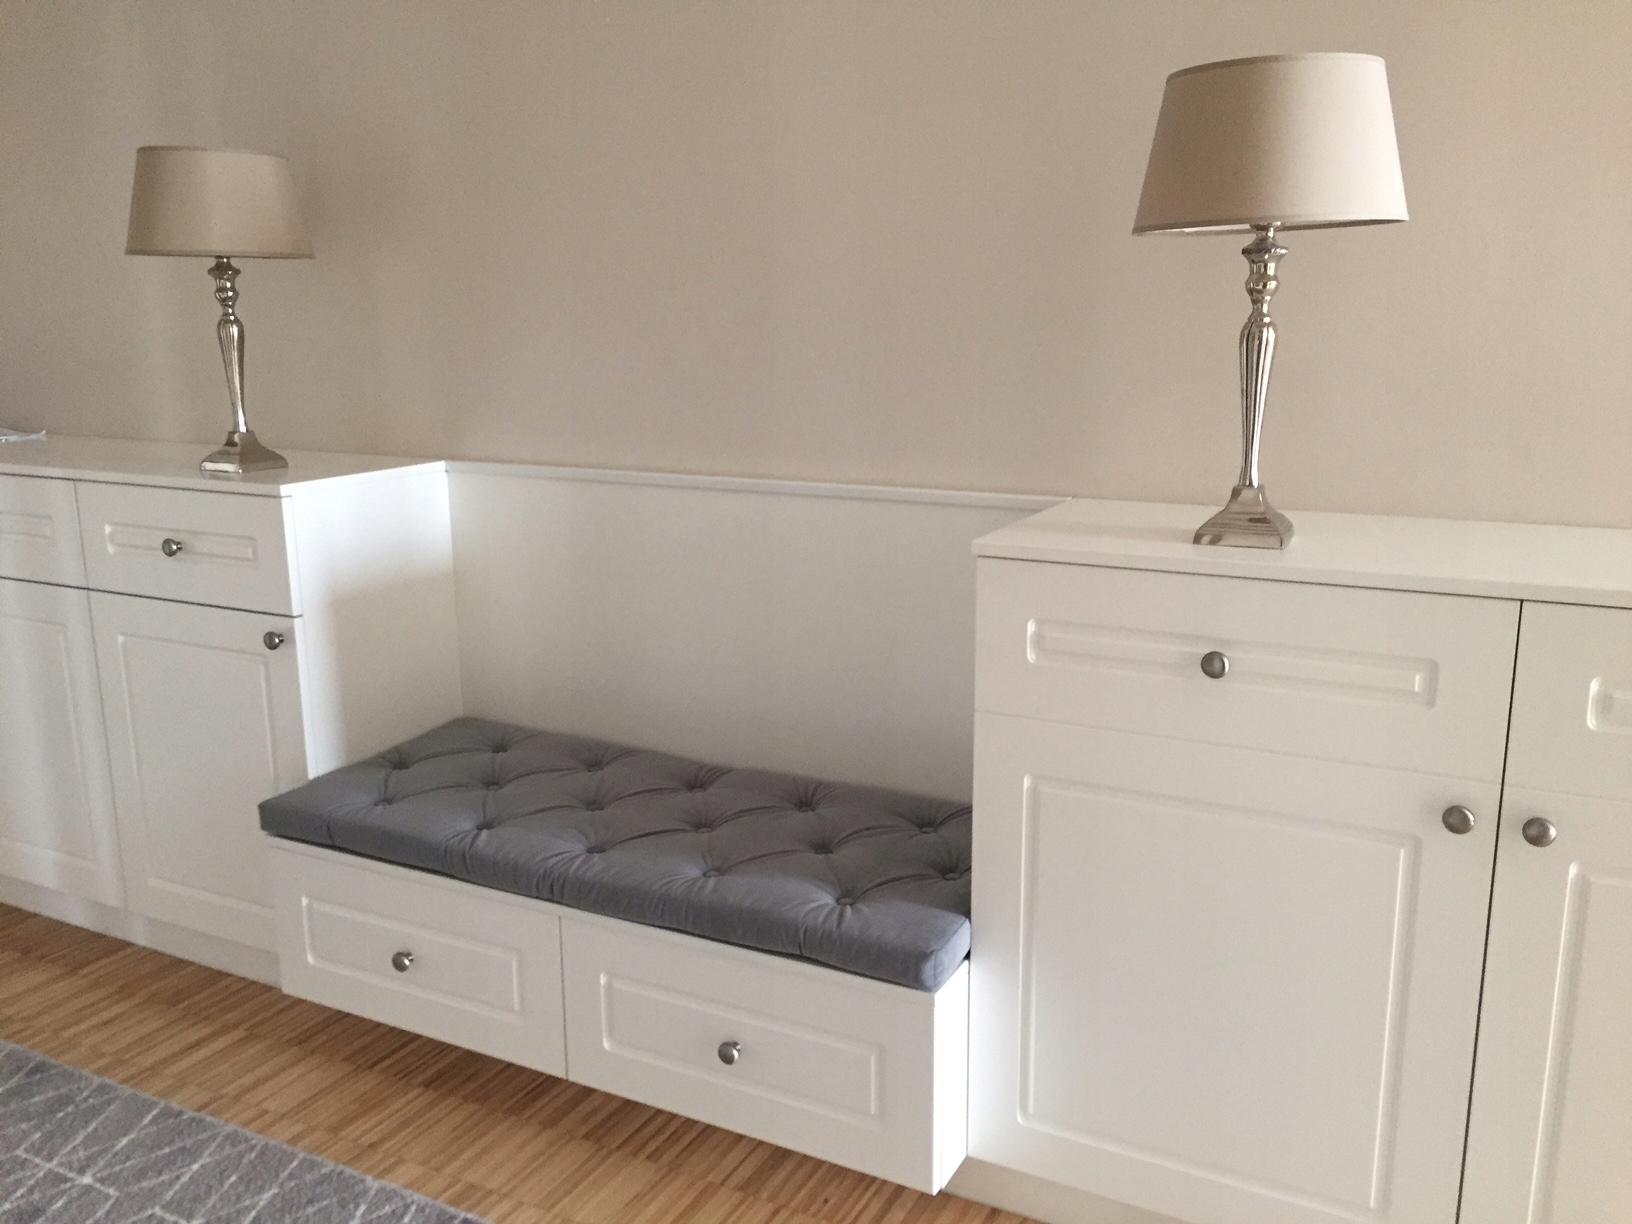 Item seat cushion padding for niche custom